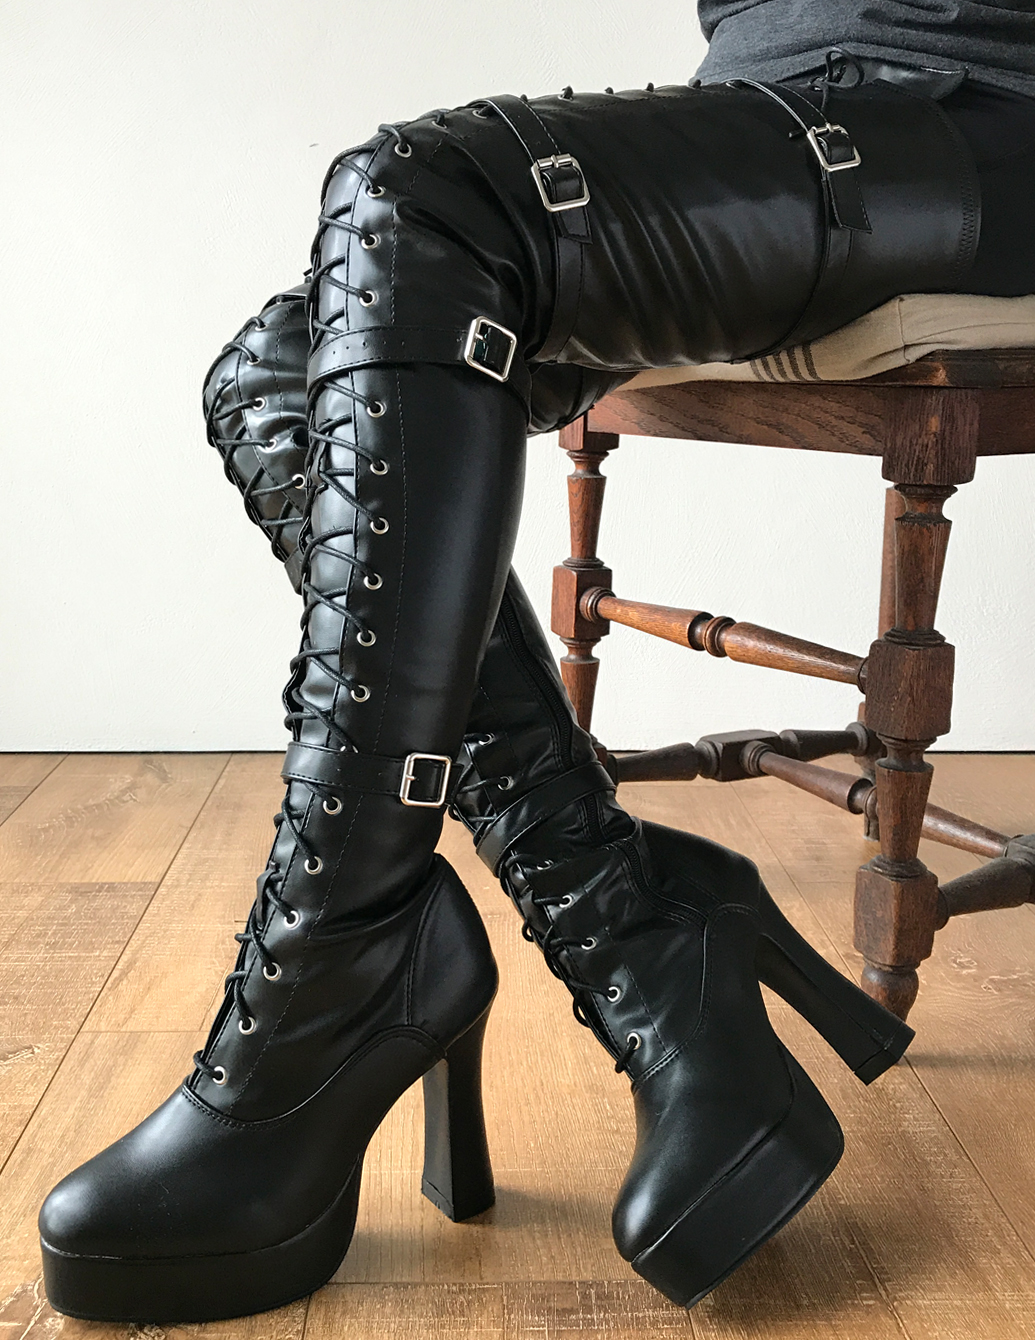 rebelsmarket_chuk_12cm_spool_heel_platform_crotch_goth_punk_pinup_cosplay_fetish_boots_boots_11.jpg